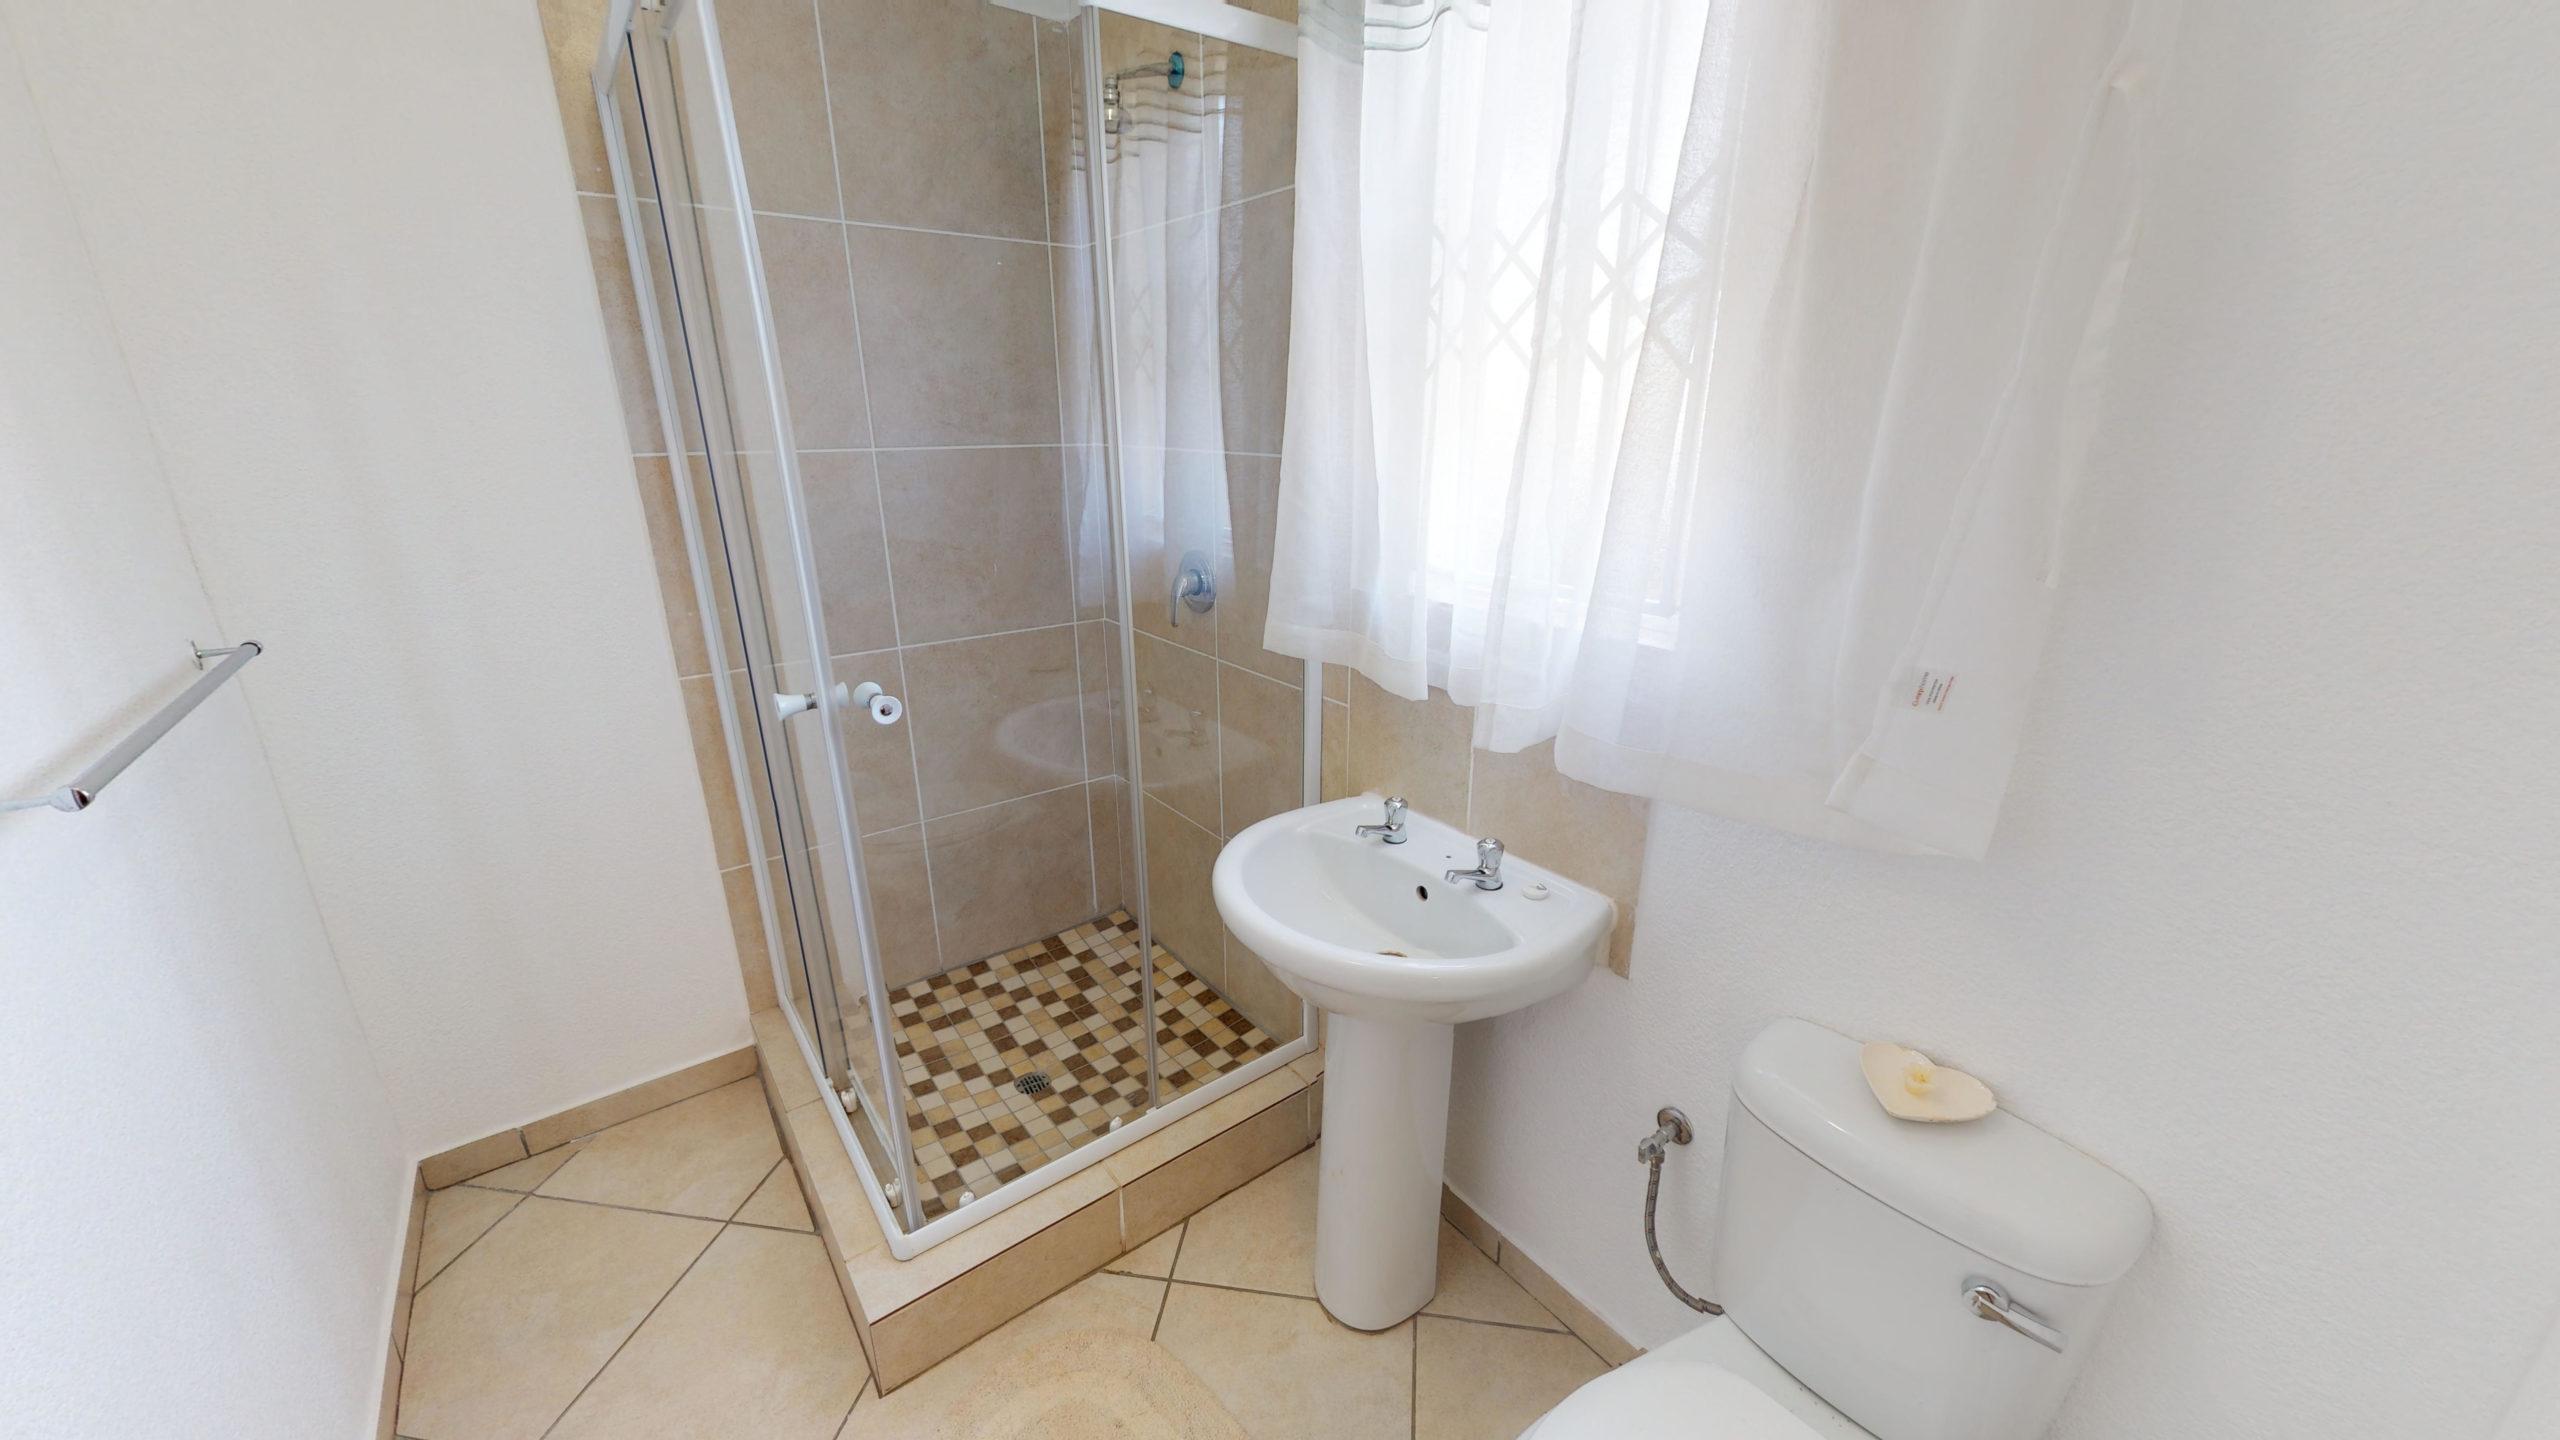 Palm Springs, Homes for Sale in Stretford, Gauteng - Bathroom